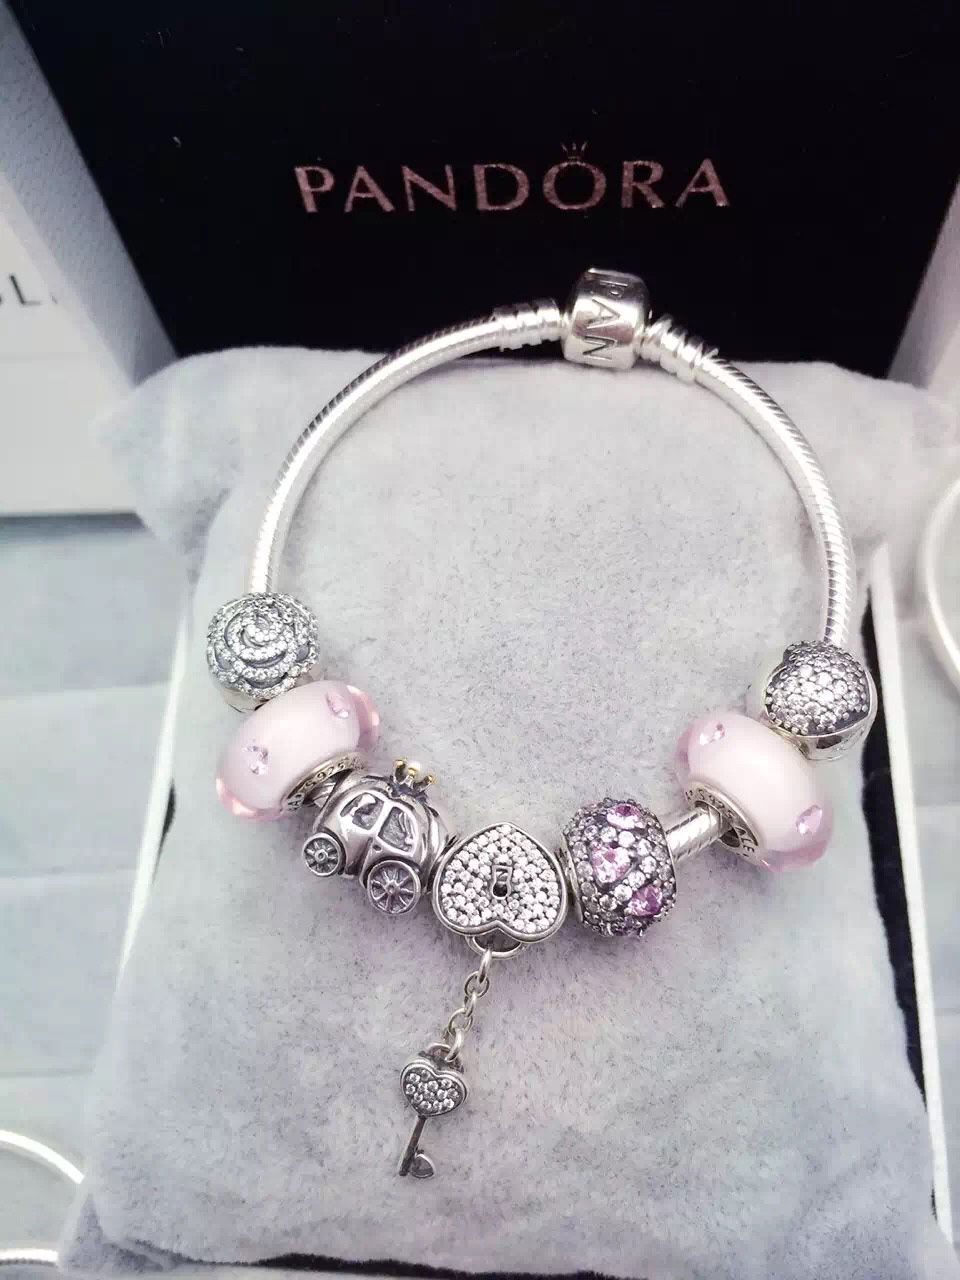 8591805b4 $199 Pandora Charm Bracelet Pink. Hot Sale!!! SKU: CB01584 - PANDORA  Bracelet Ideas